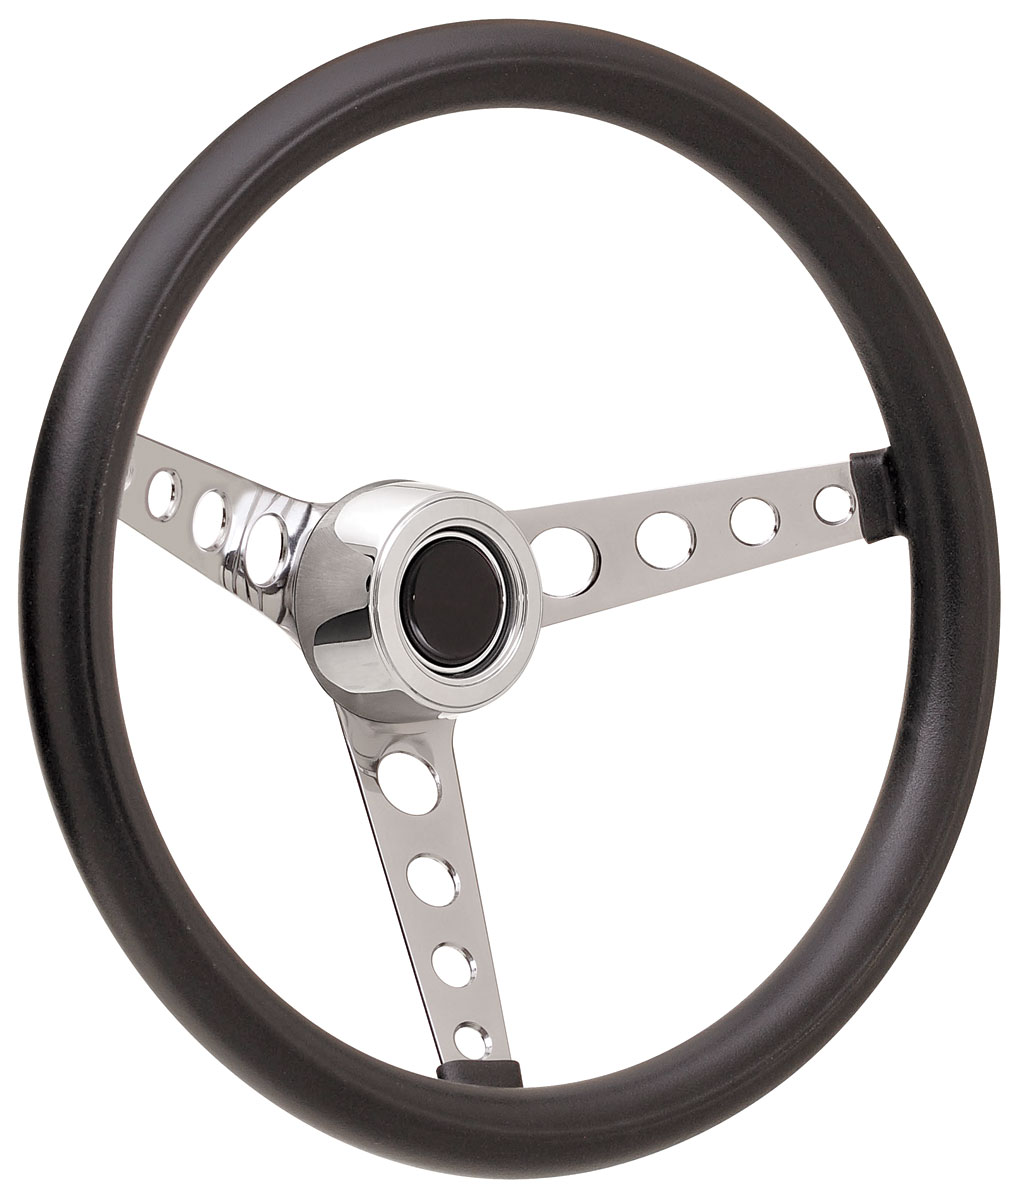 Steering Wheel Kit, 59-68 GM, Classic Foam, Hi Rise Cap, Plain, Black